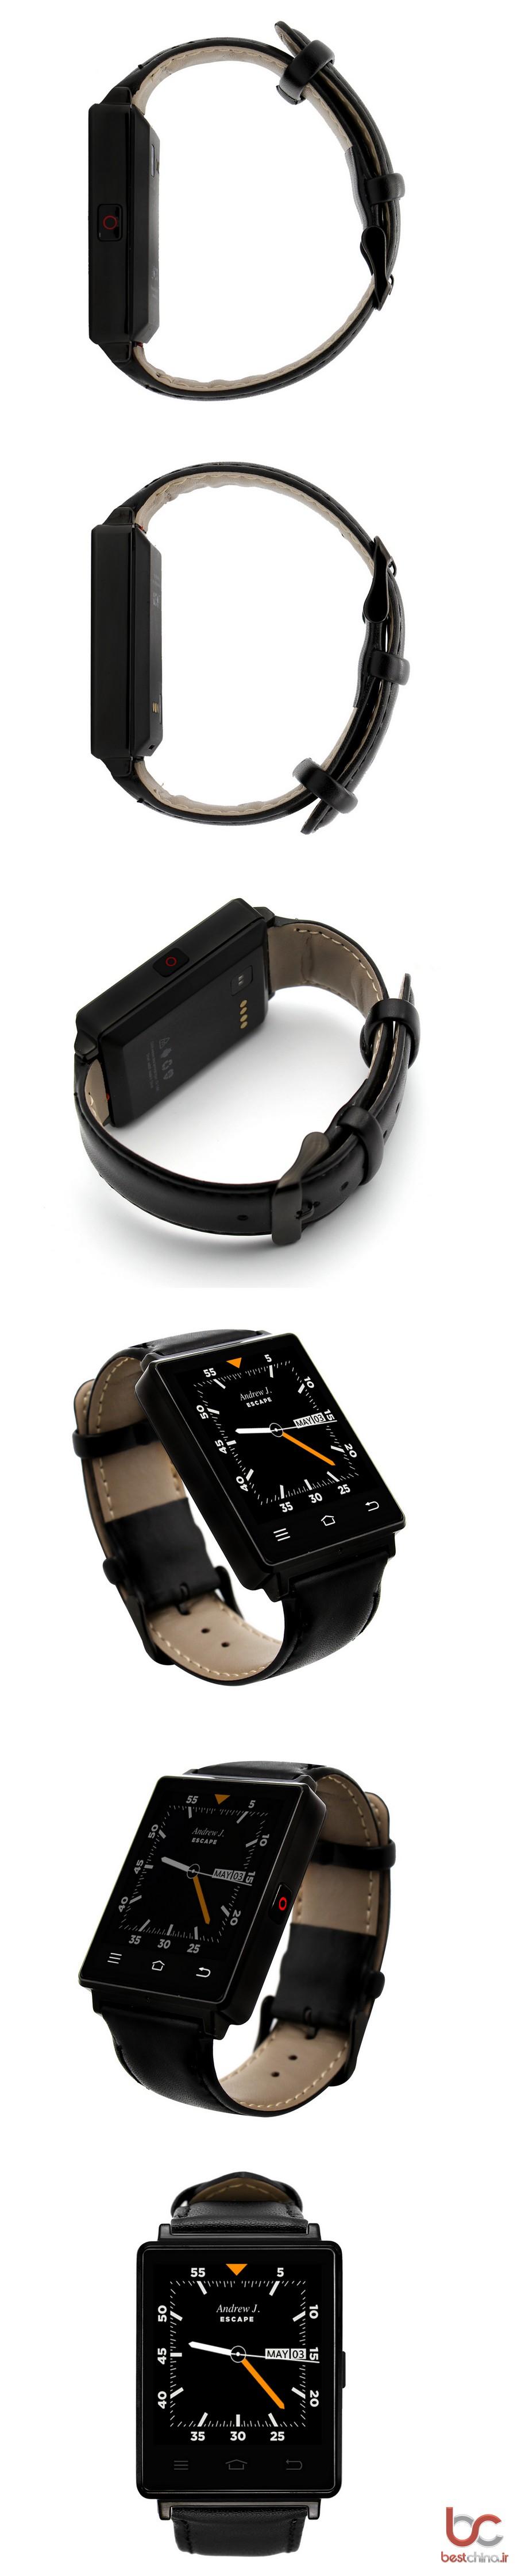 No.1 D6 smartwatch (8)